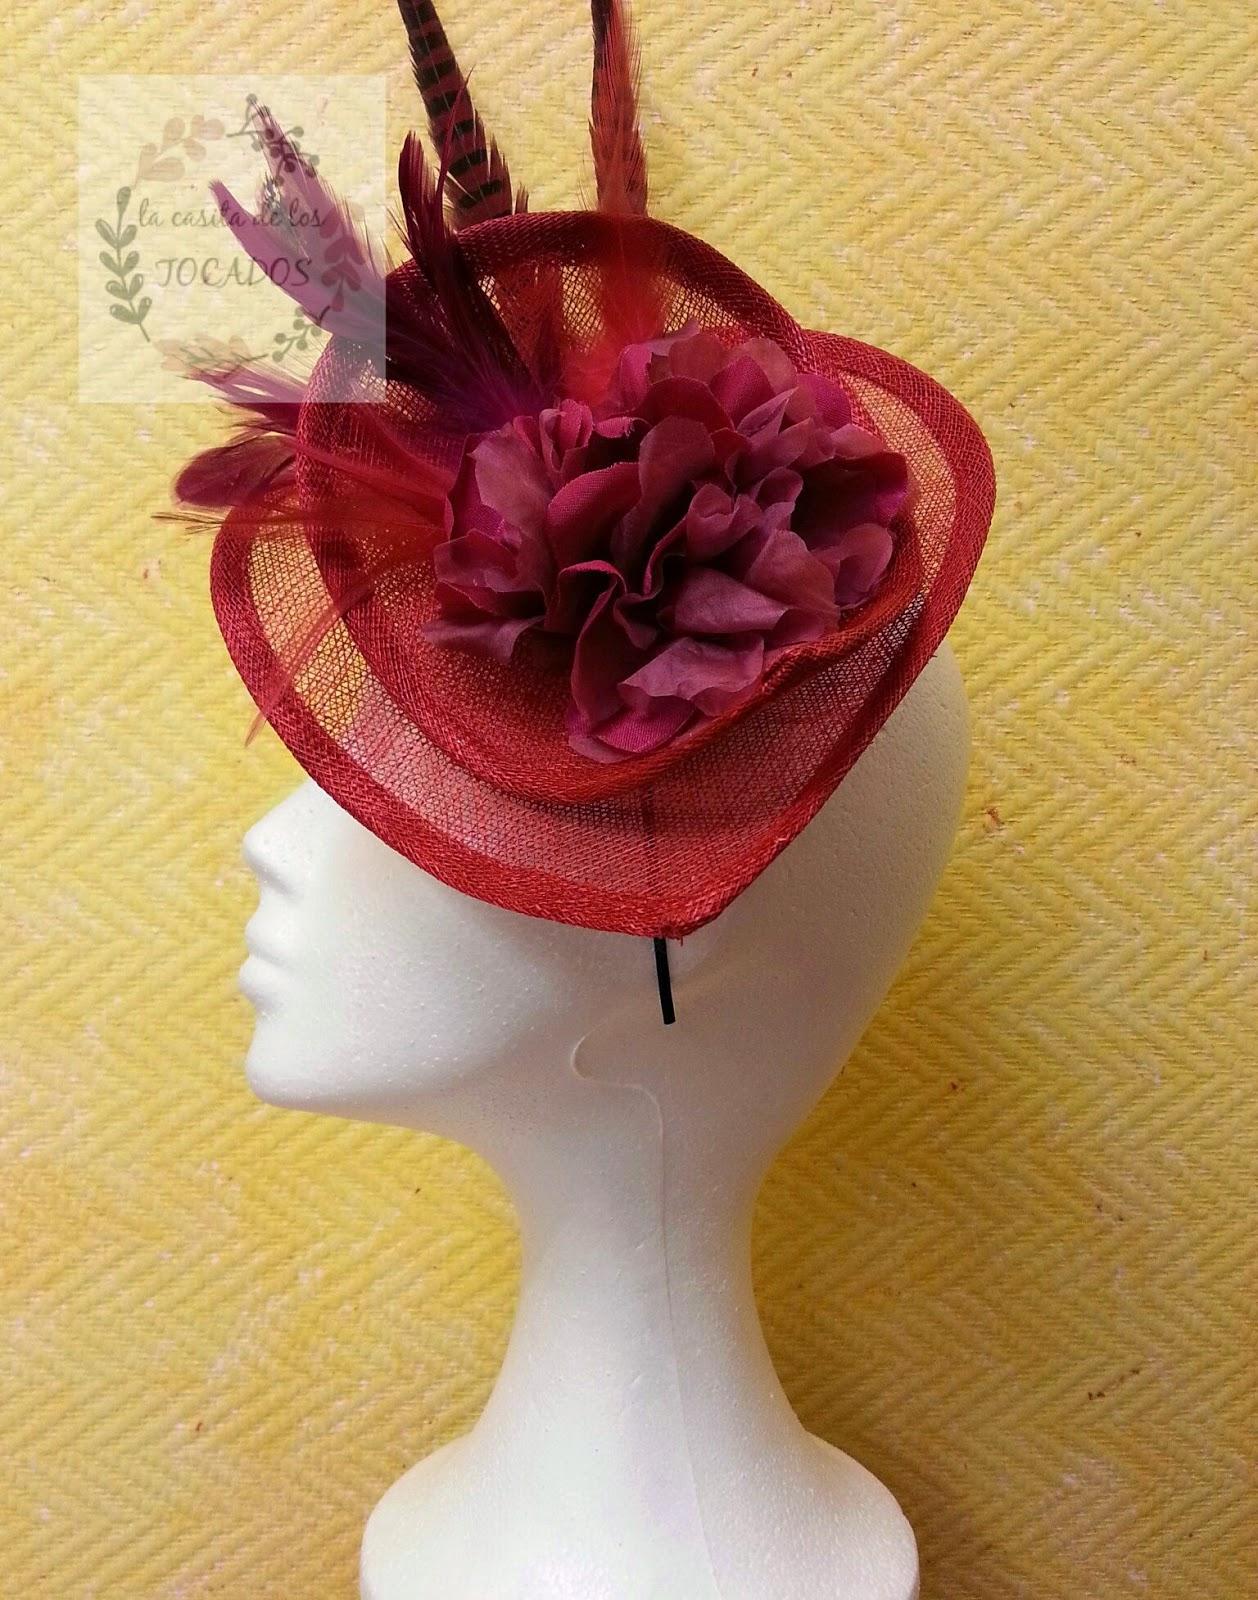 tocado rojo y buganvilla artesanal para boda con plumas de faisán